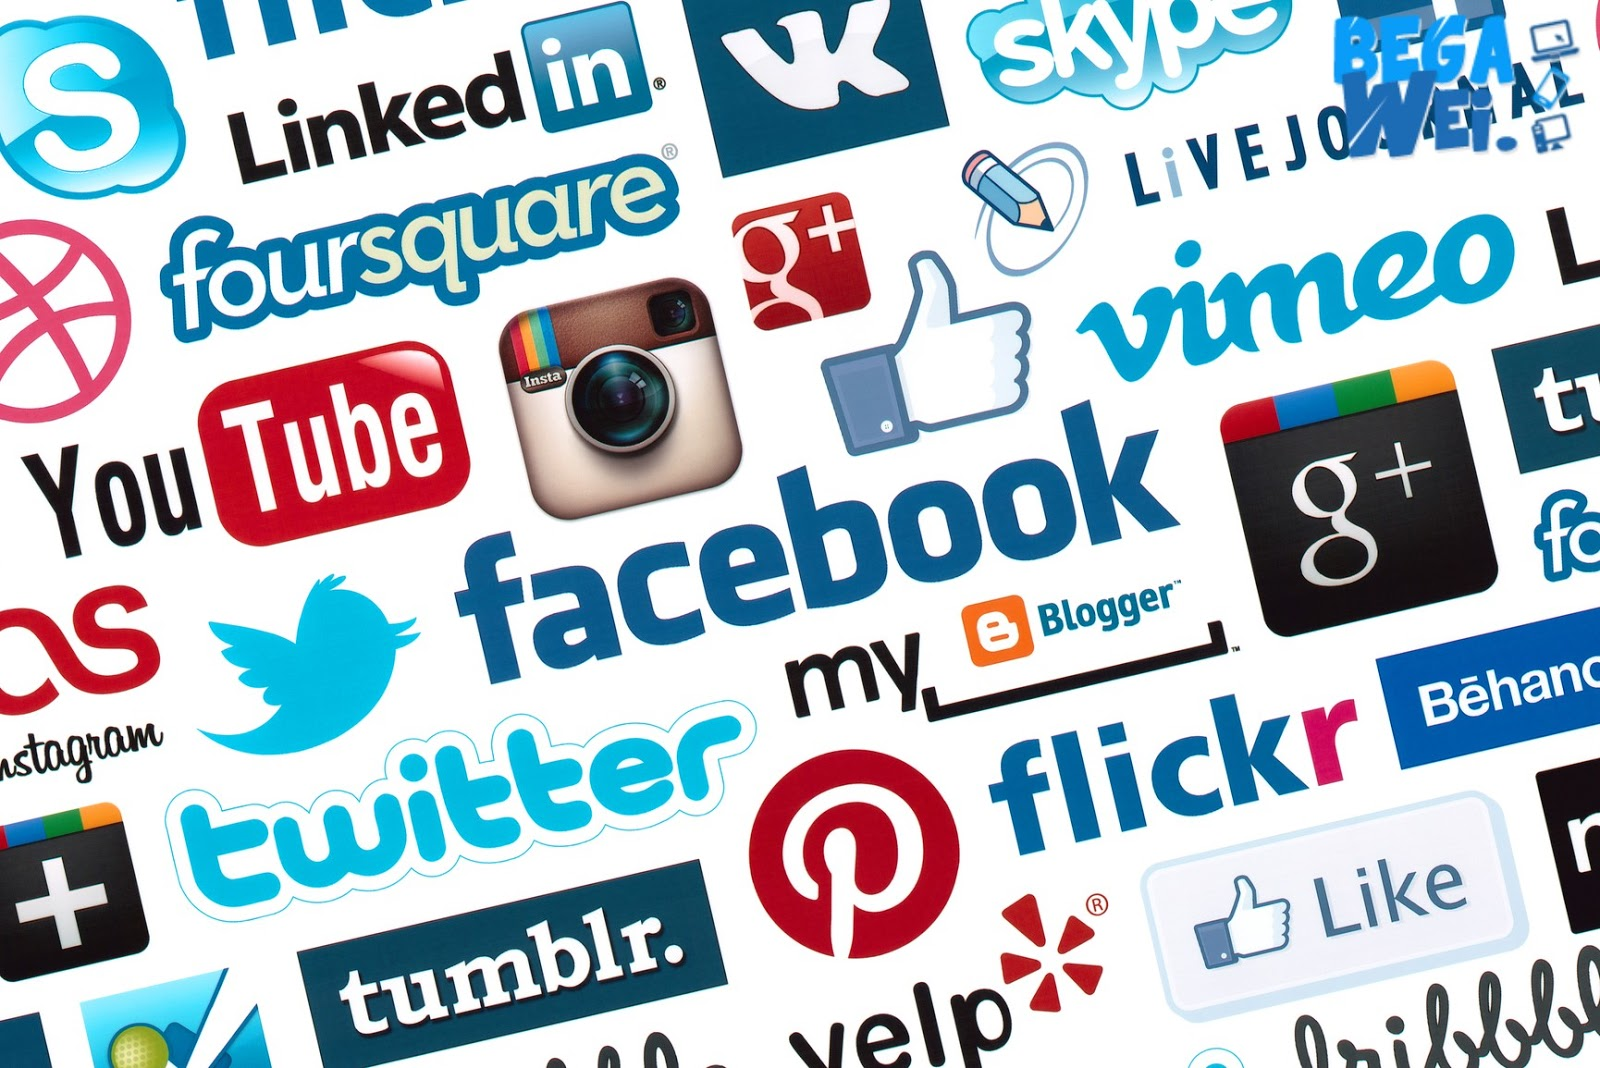 Waspada!!! POLRI Memburu 180 Ribu Akun Media Sosial yang Berkata Kotor